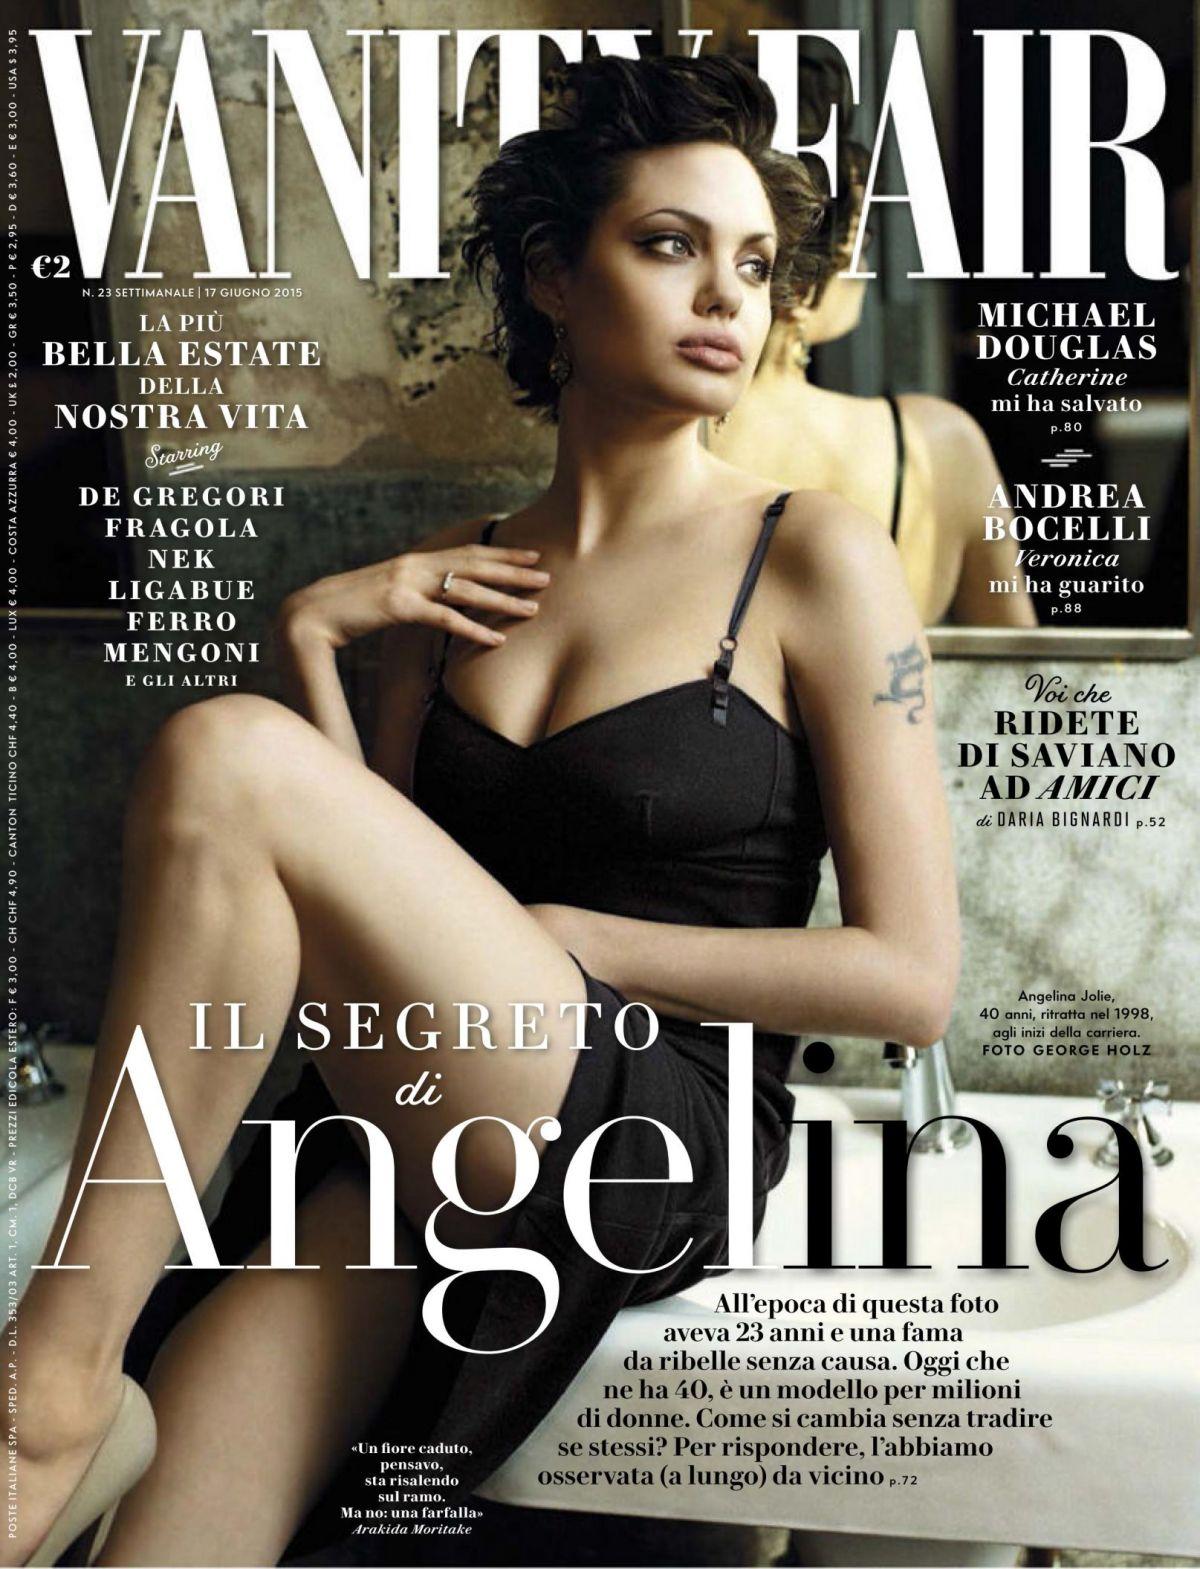 Jolie Magazine November 2017 Issue: ANGELINA JOLIE In Vanity Fair Magazine, Italy June 2015